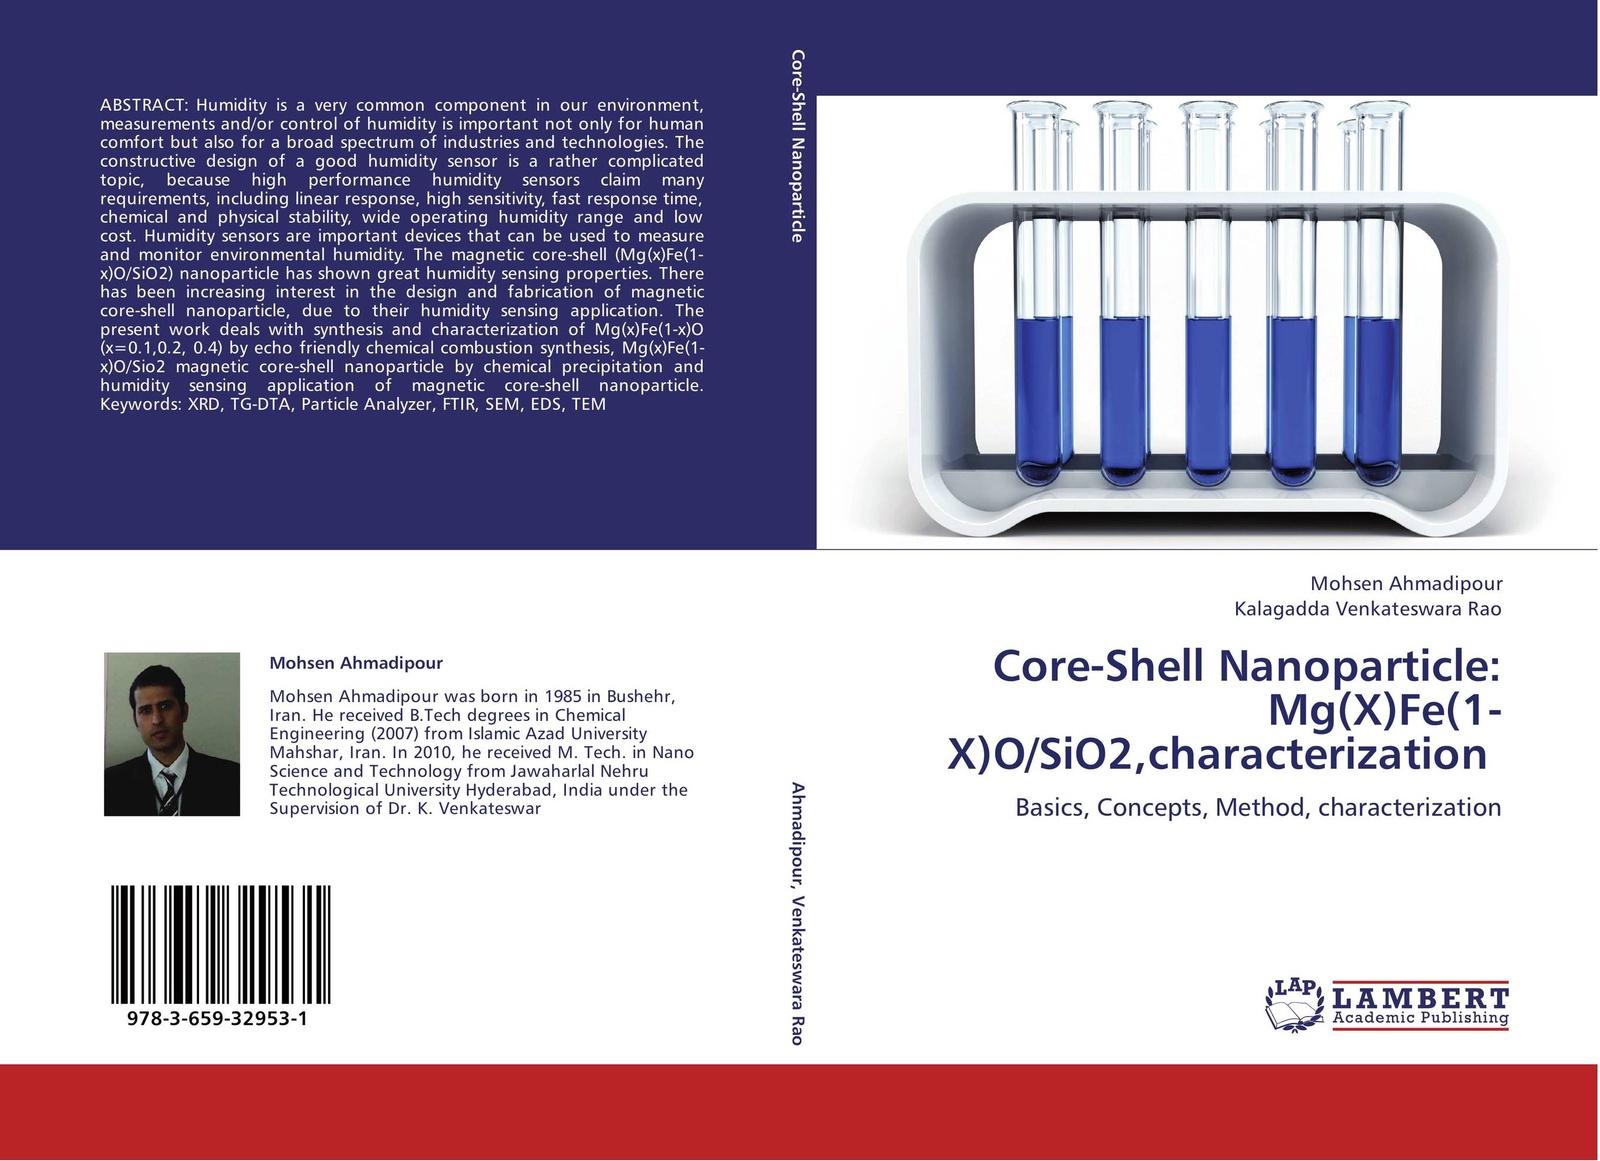 Mohsen Ahmadipour and Kalagadda Venkateswara Rao Core-Shell Nanoparticle: Mg(X)Fe(1-X)O/SiO2,characterization